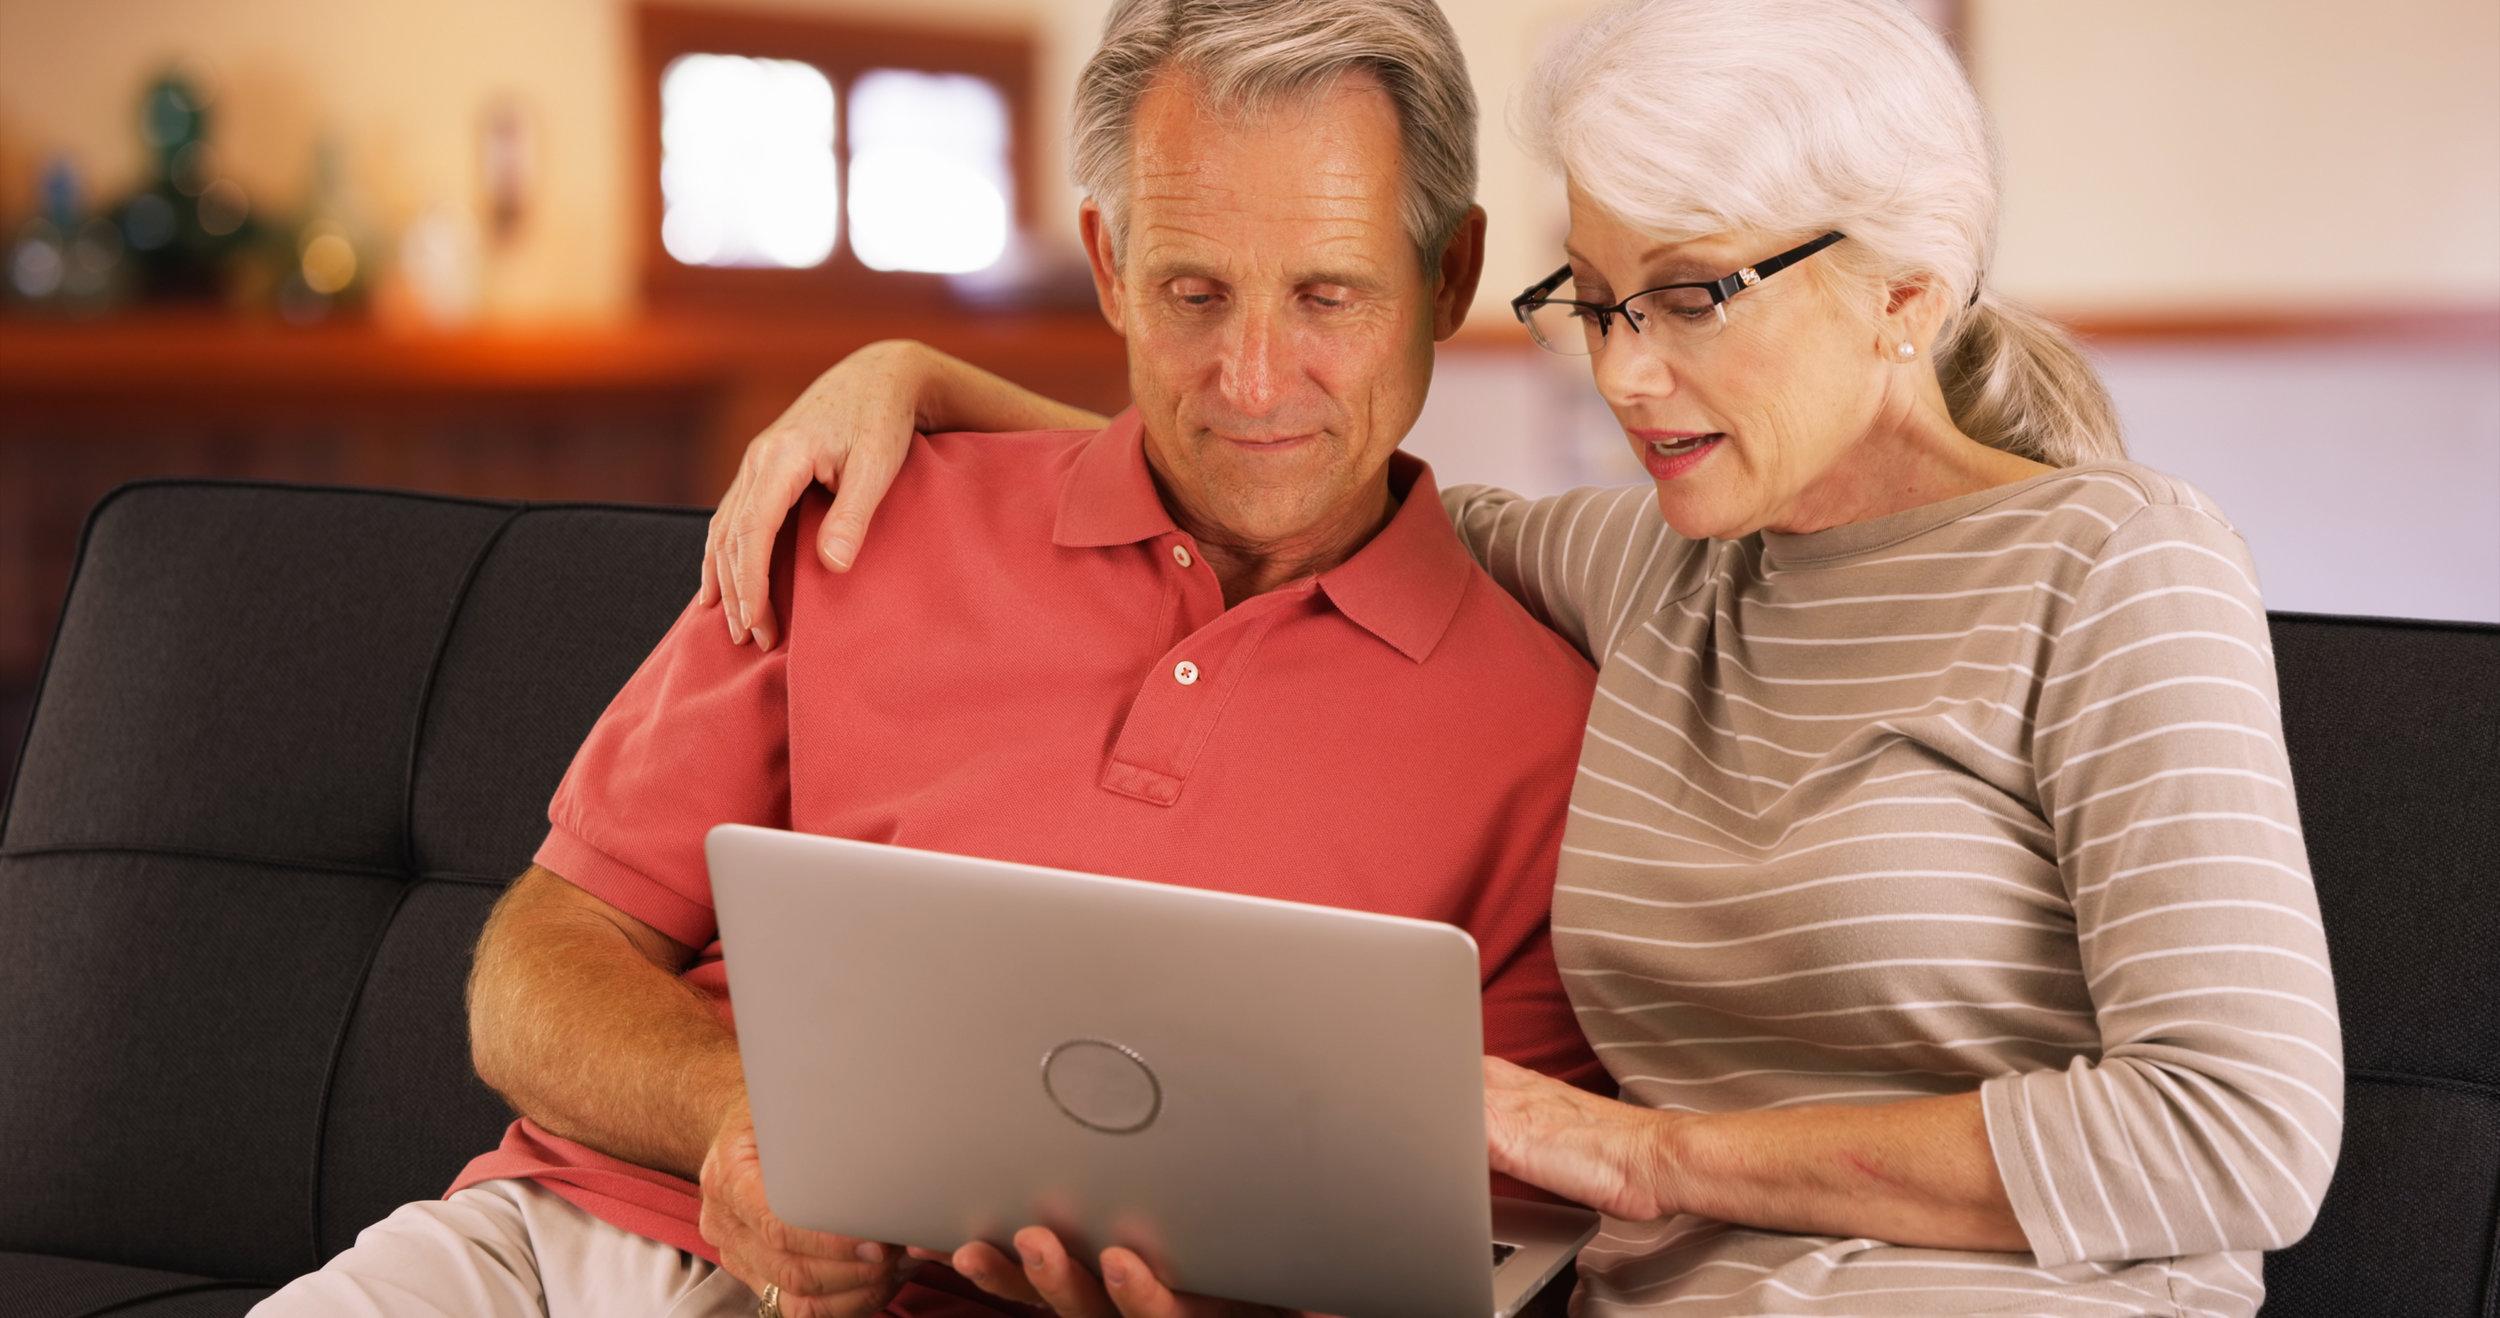 couple using laptop dreamstime_xxl_85373019.jpg